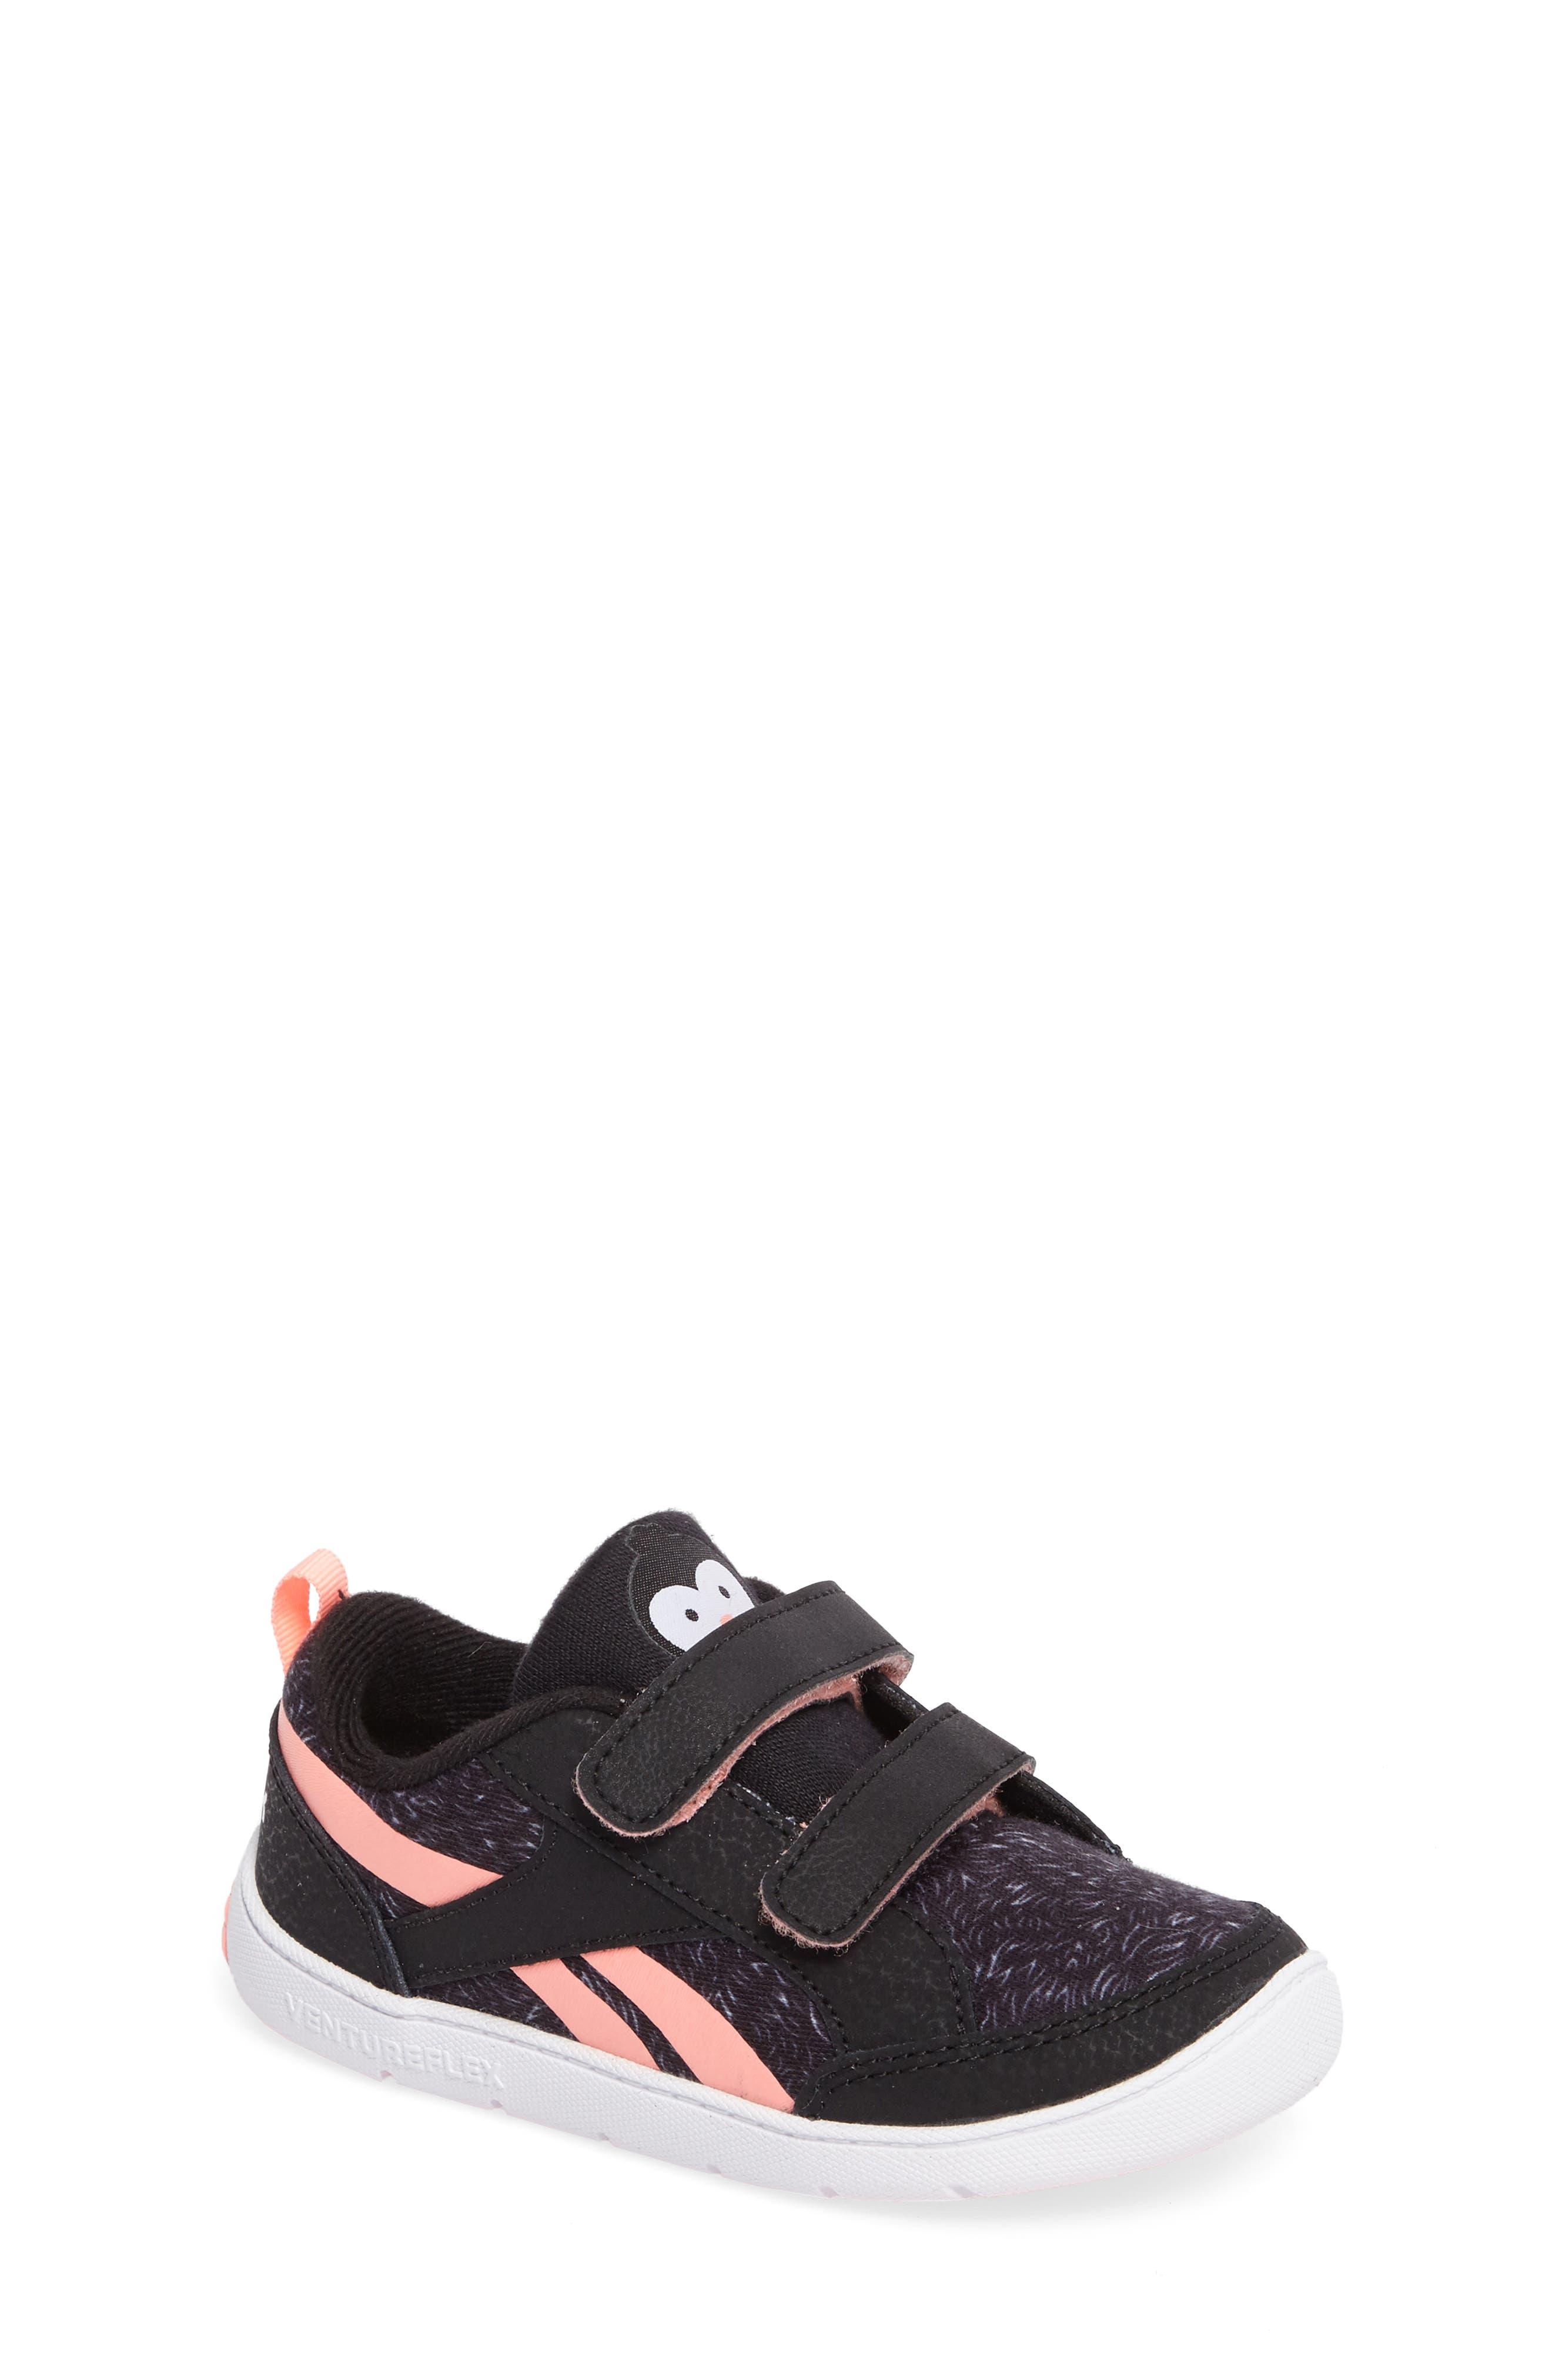 Ventureflex Critter Feet Sneaker,                         Main,                         color, Artic Black/ White/ Sour Melon